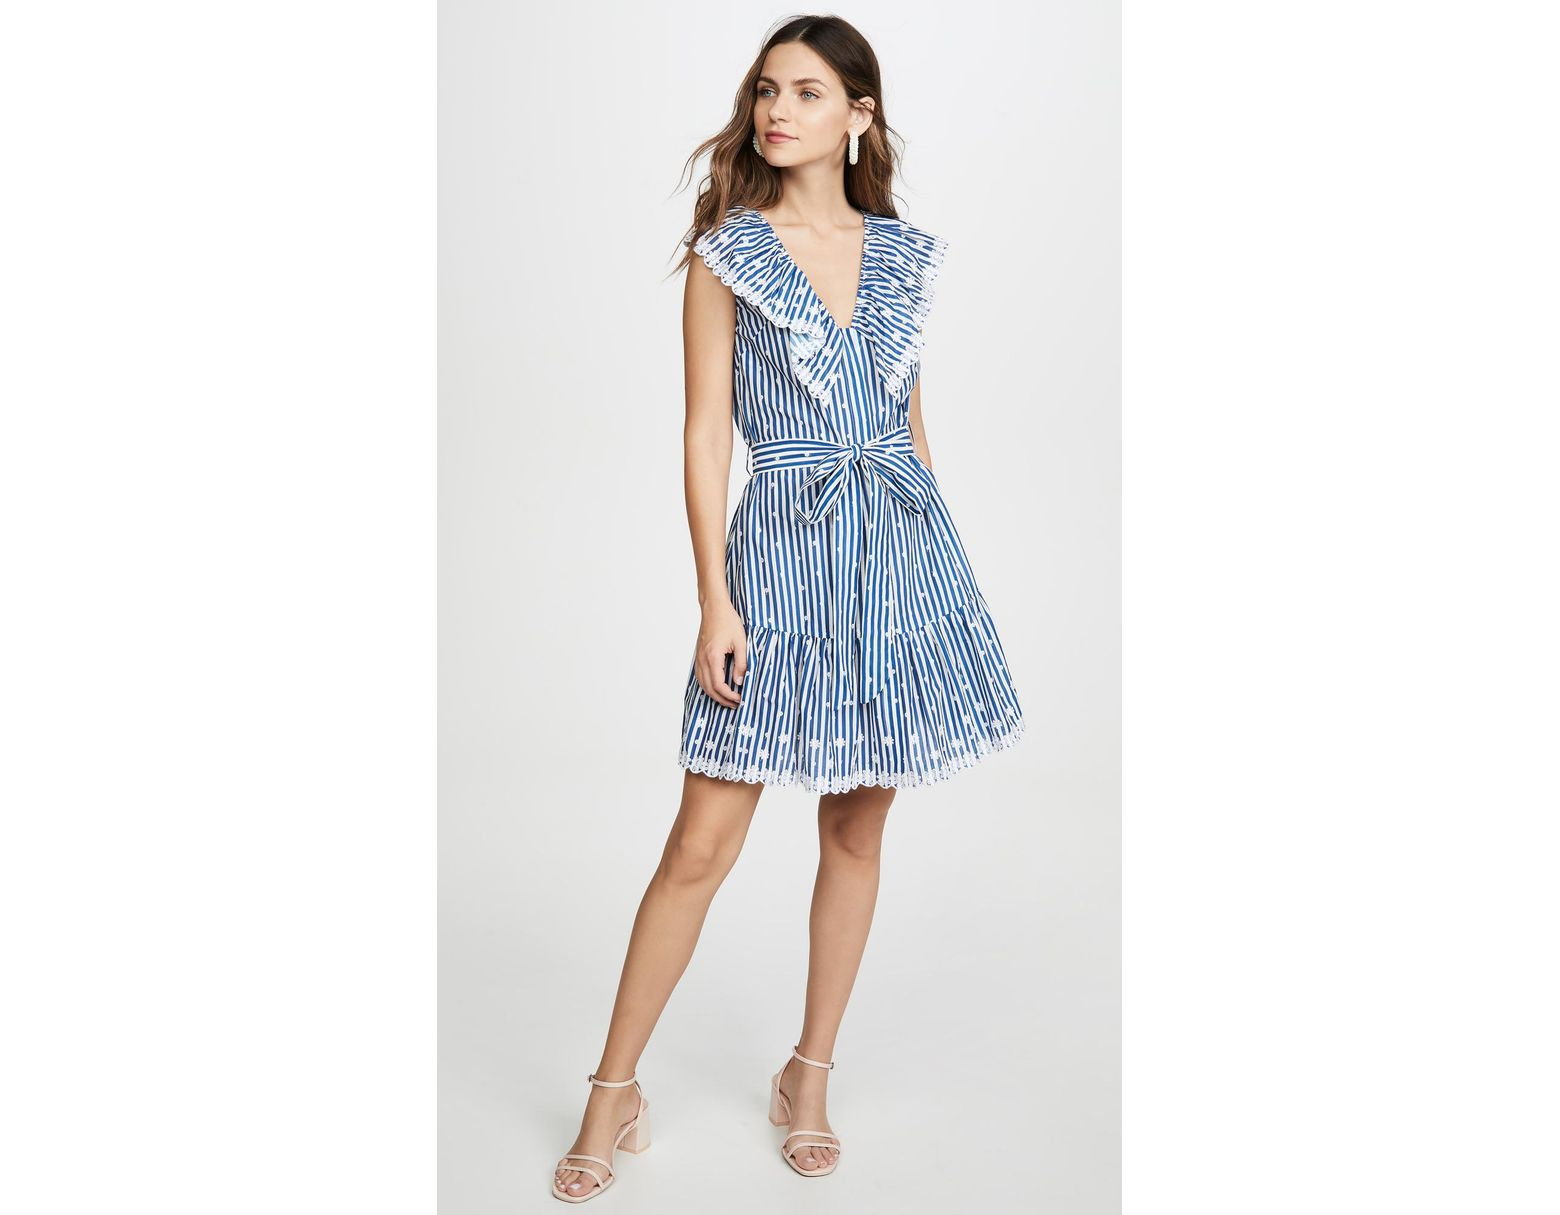 8fa197c8d336b Miguelina Rosalie Mini Dress in Blue - Lyst